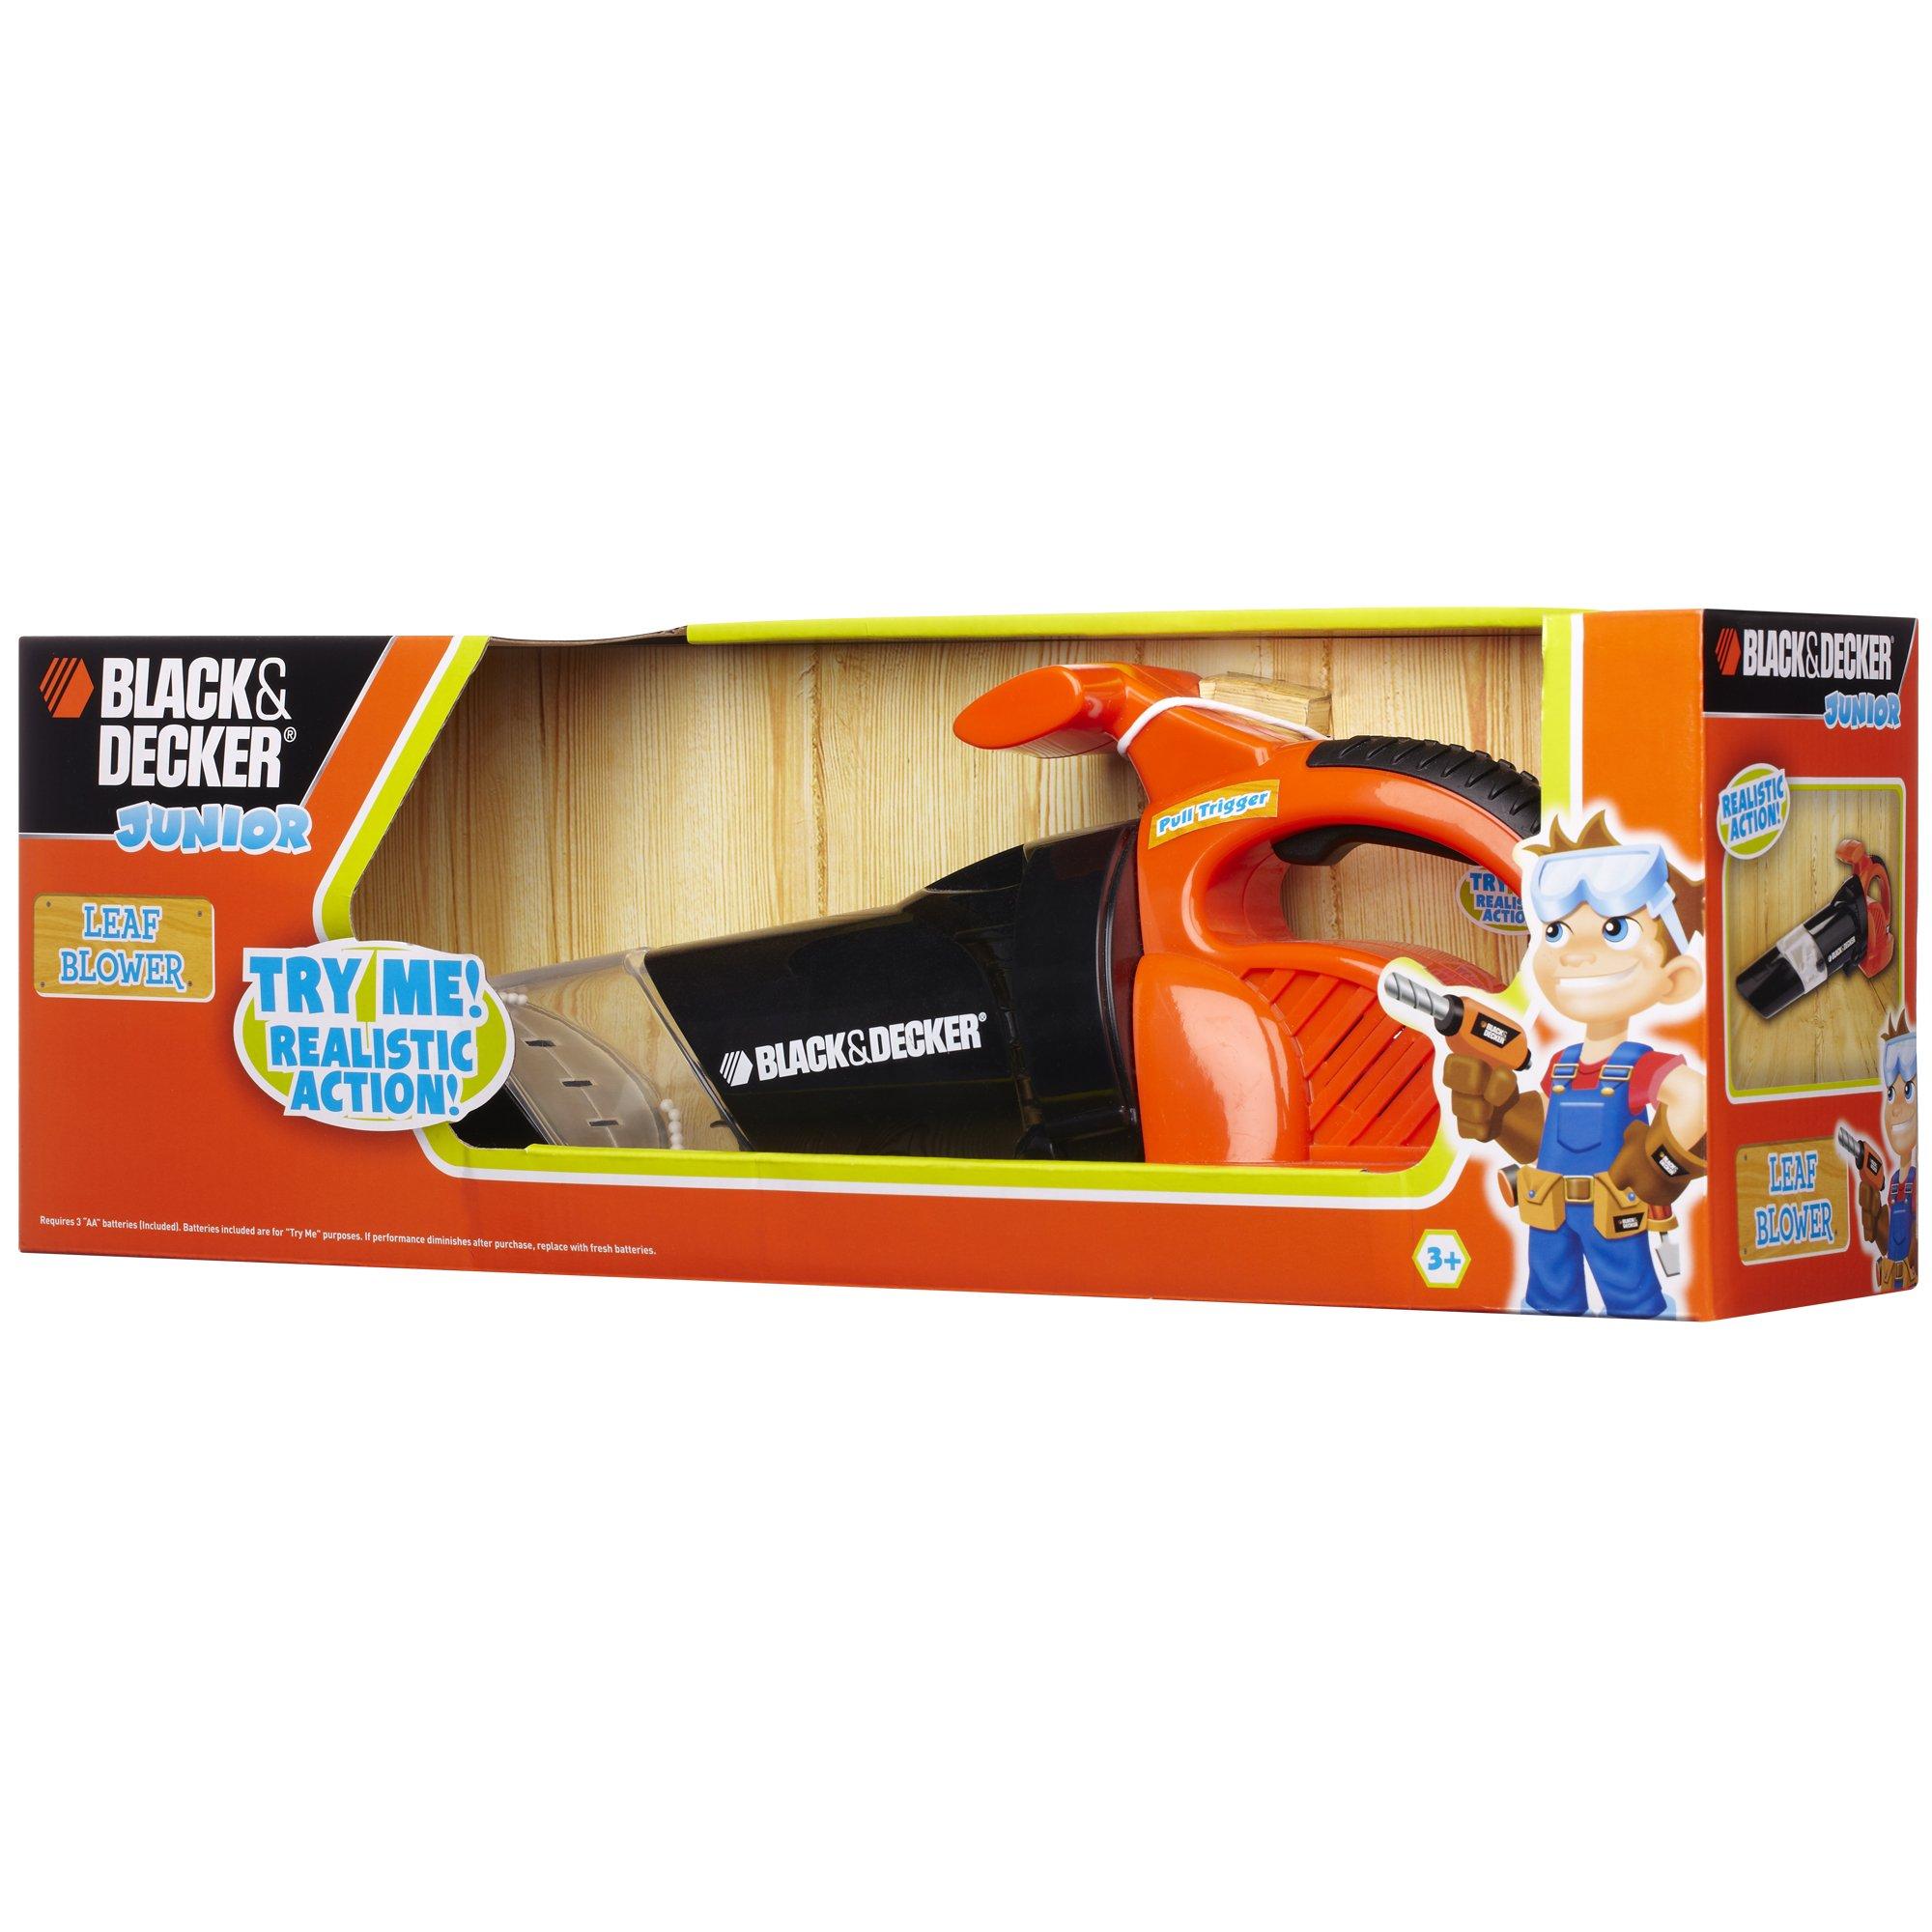 BLACK+DECKER Black and Decker Outdoor Tool Set - Leaf Blower